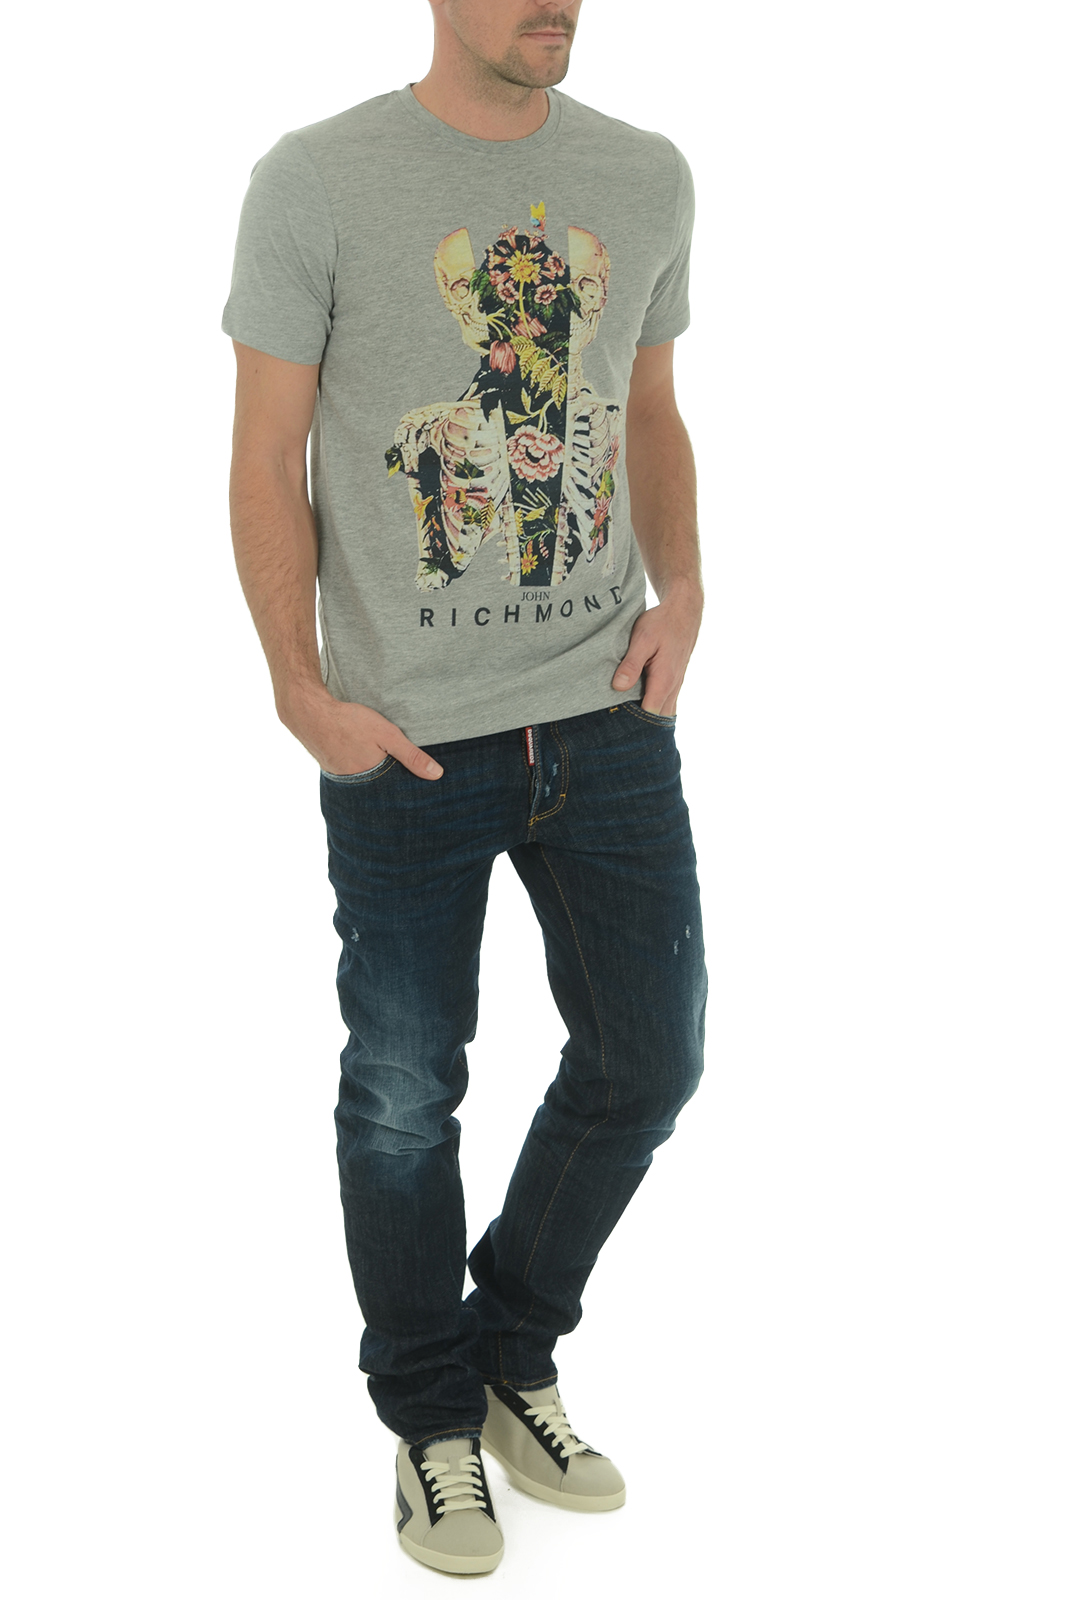 Tee-shirts  John richmond CURVELADIA W0066 GRIGIO MEL